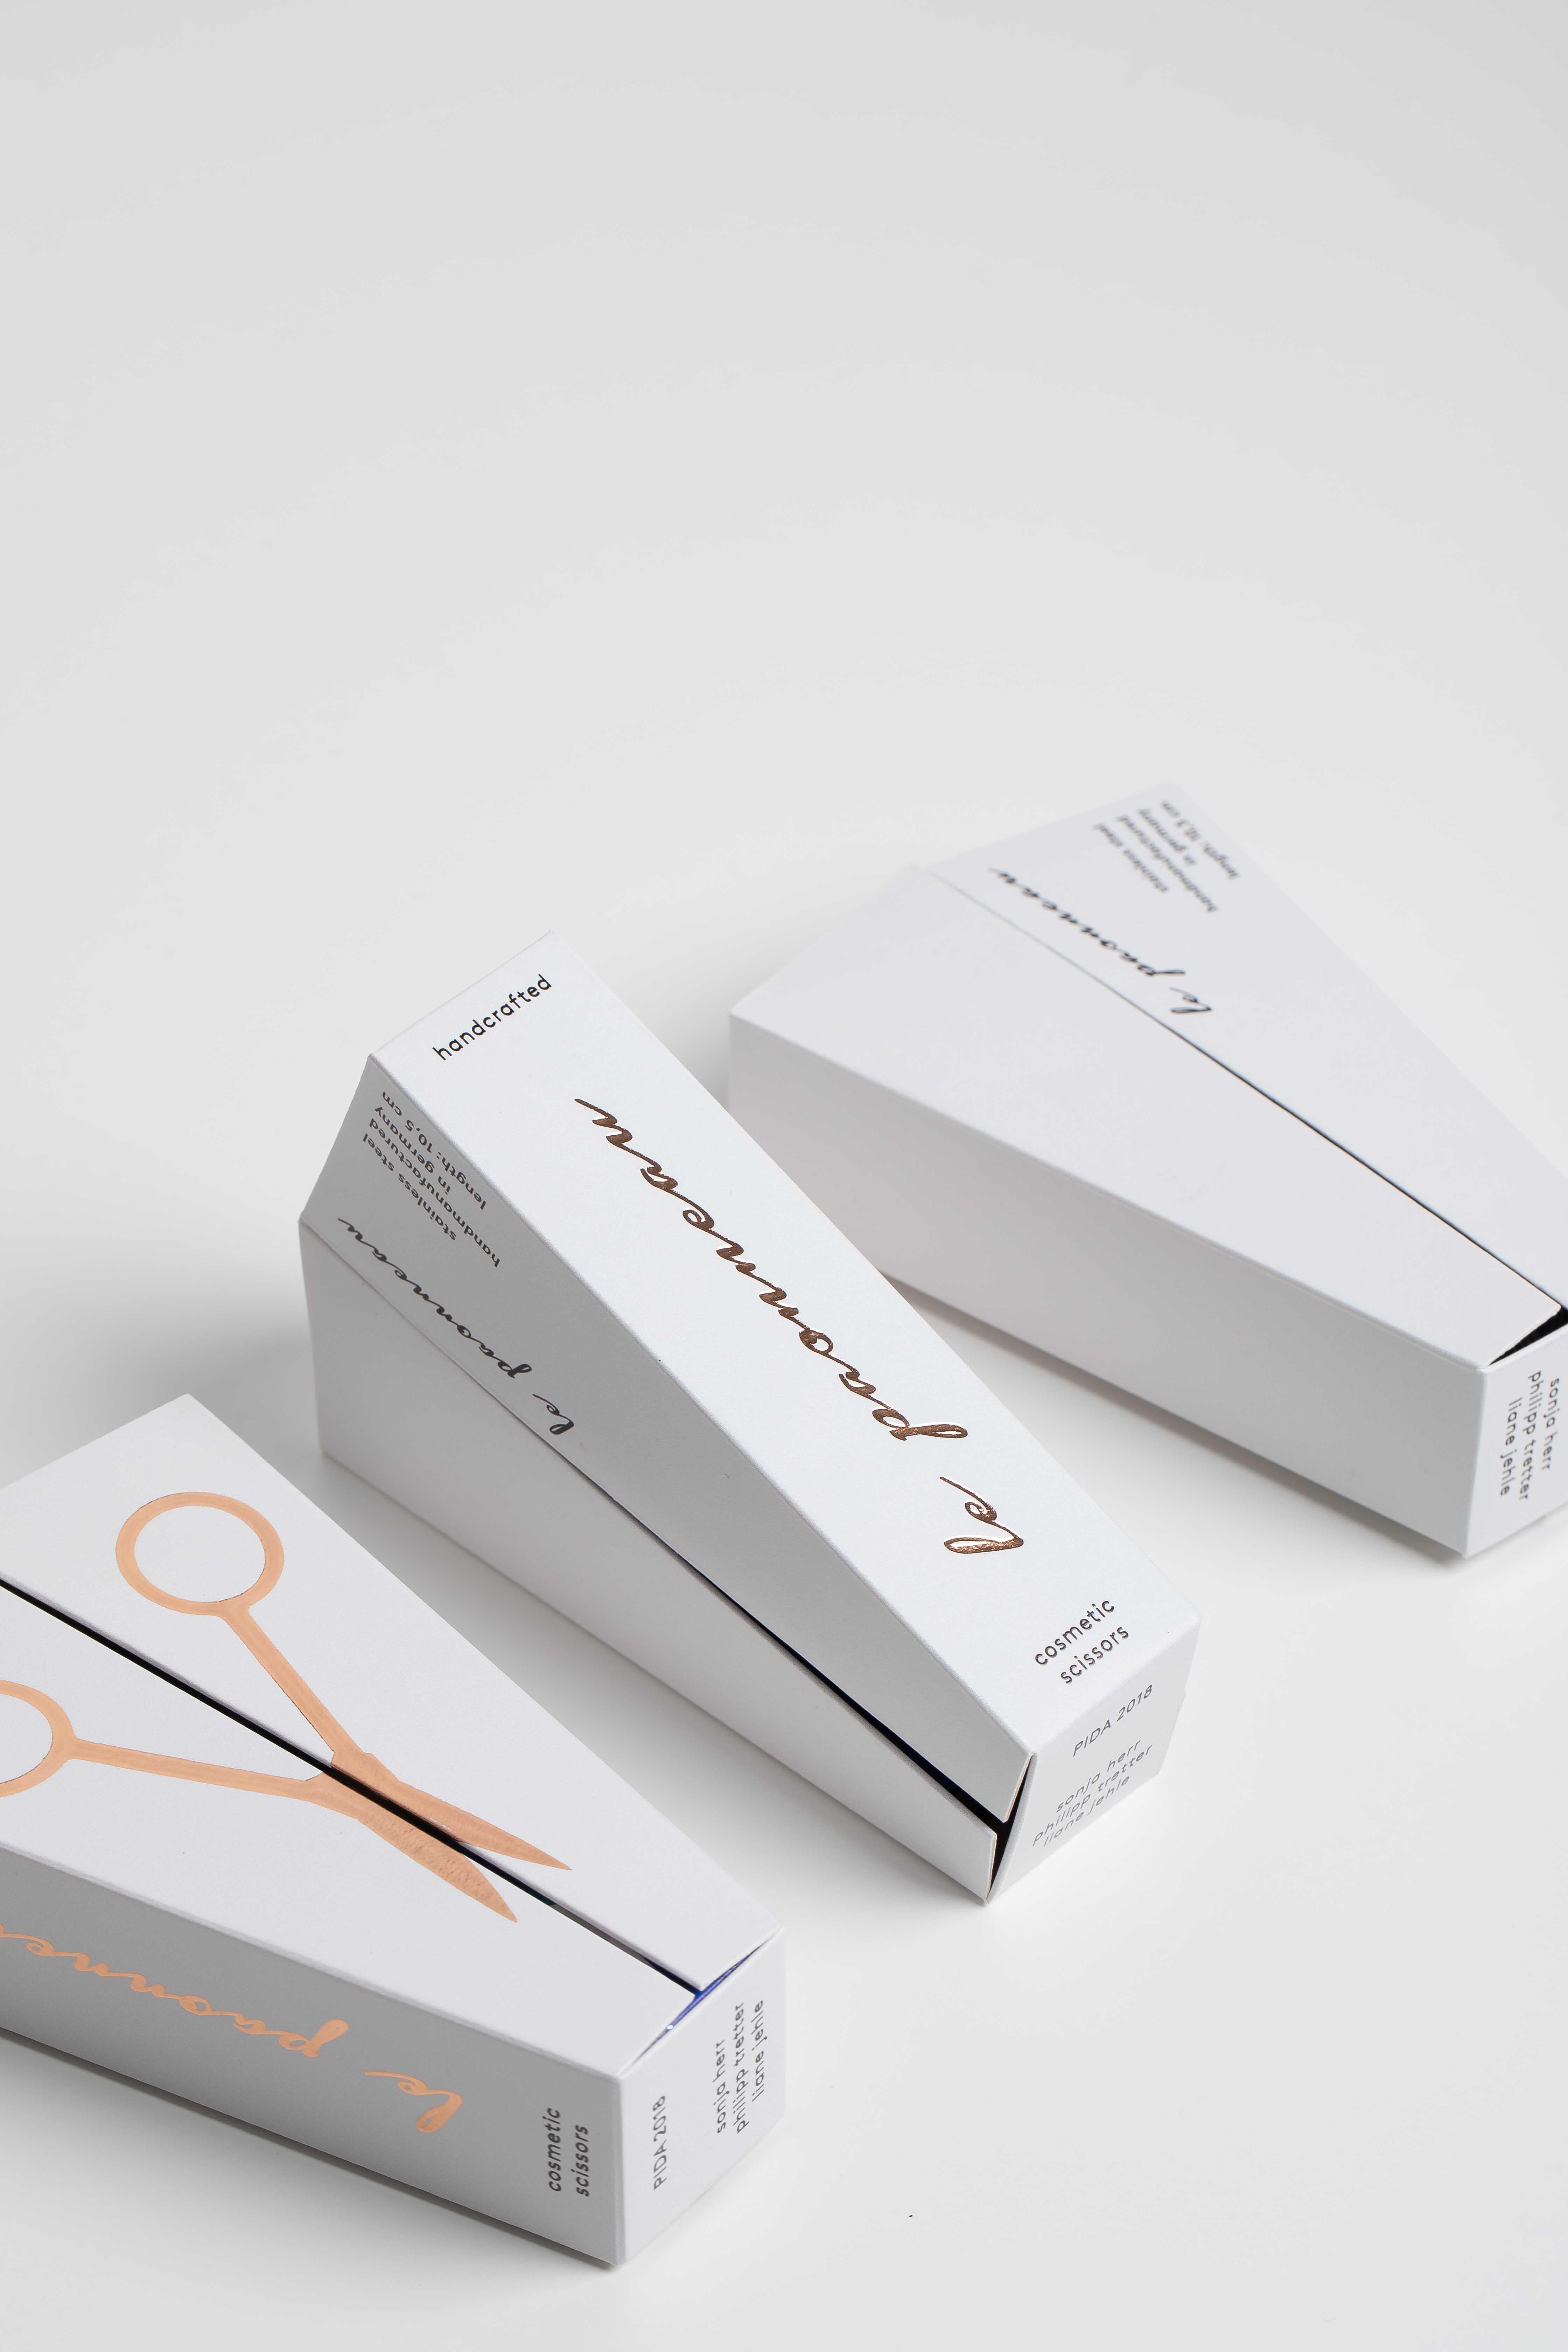 carton-award-image 216557